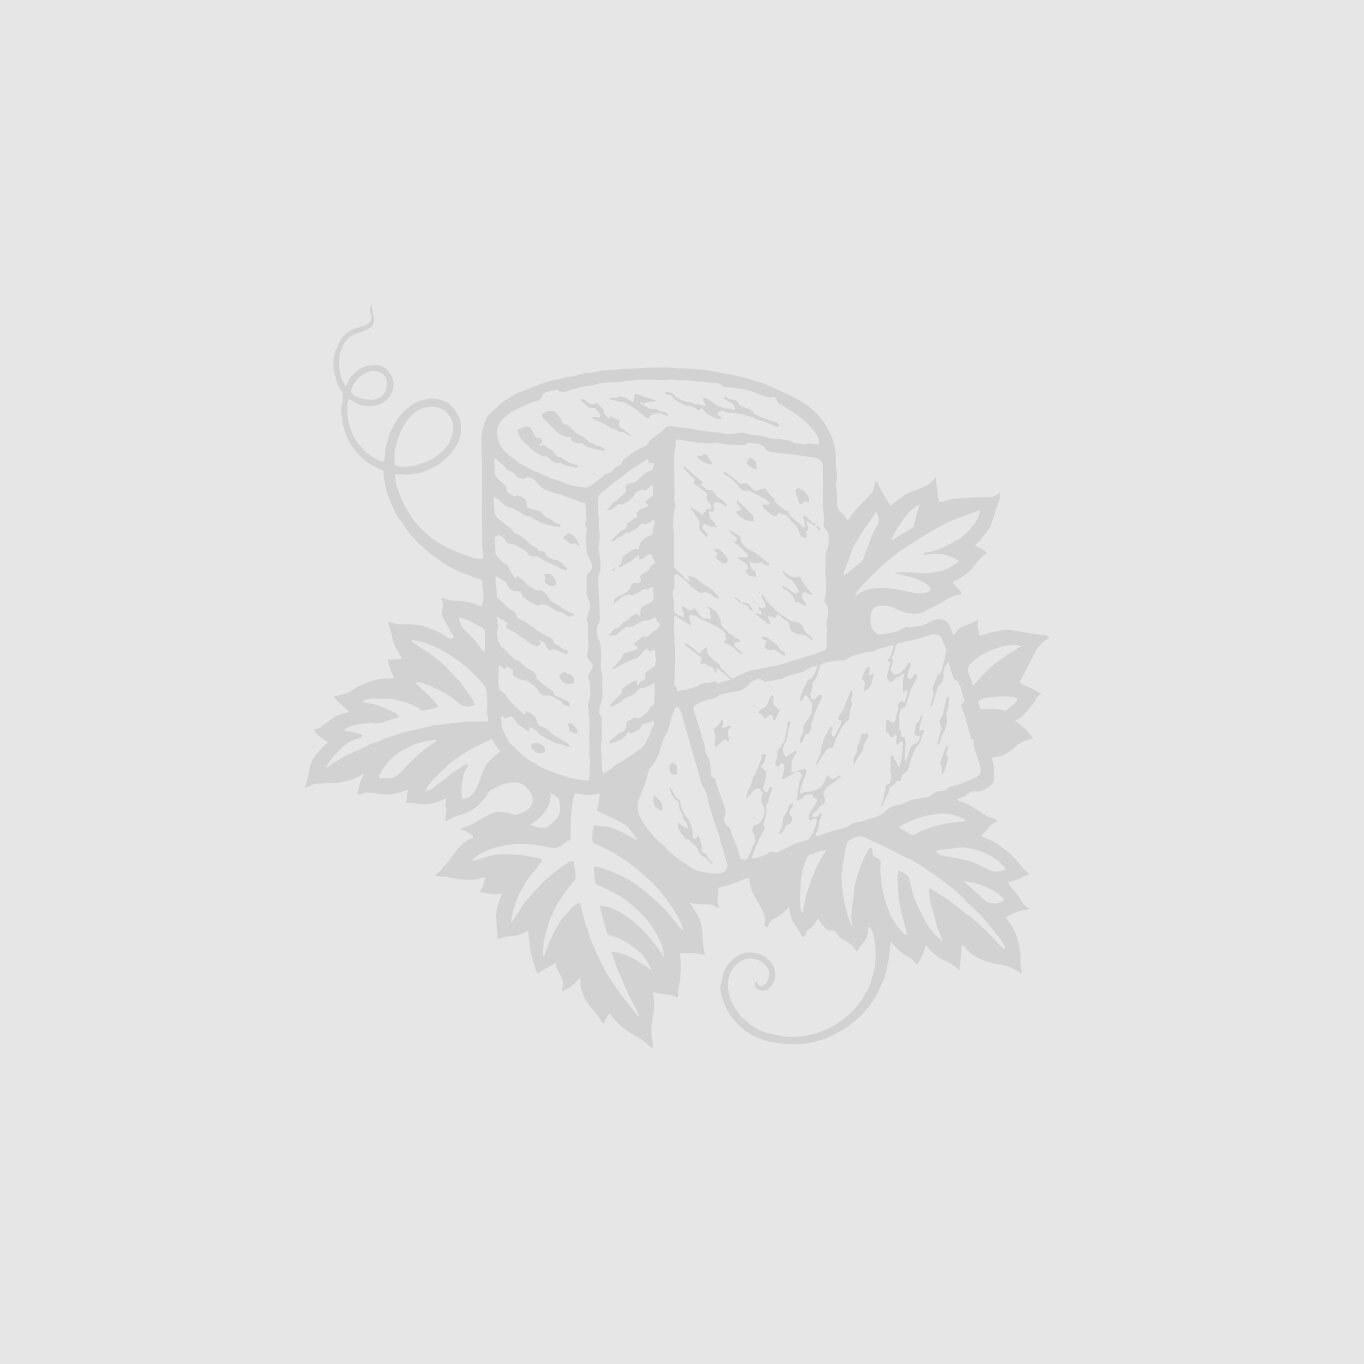 Extra Vecchio 25 Year ABTM DOP Balsamic Vinegar